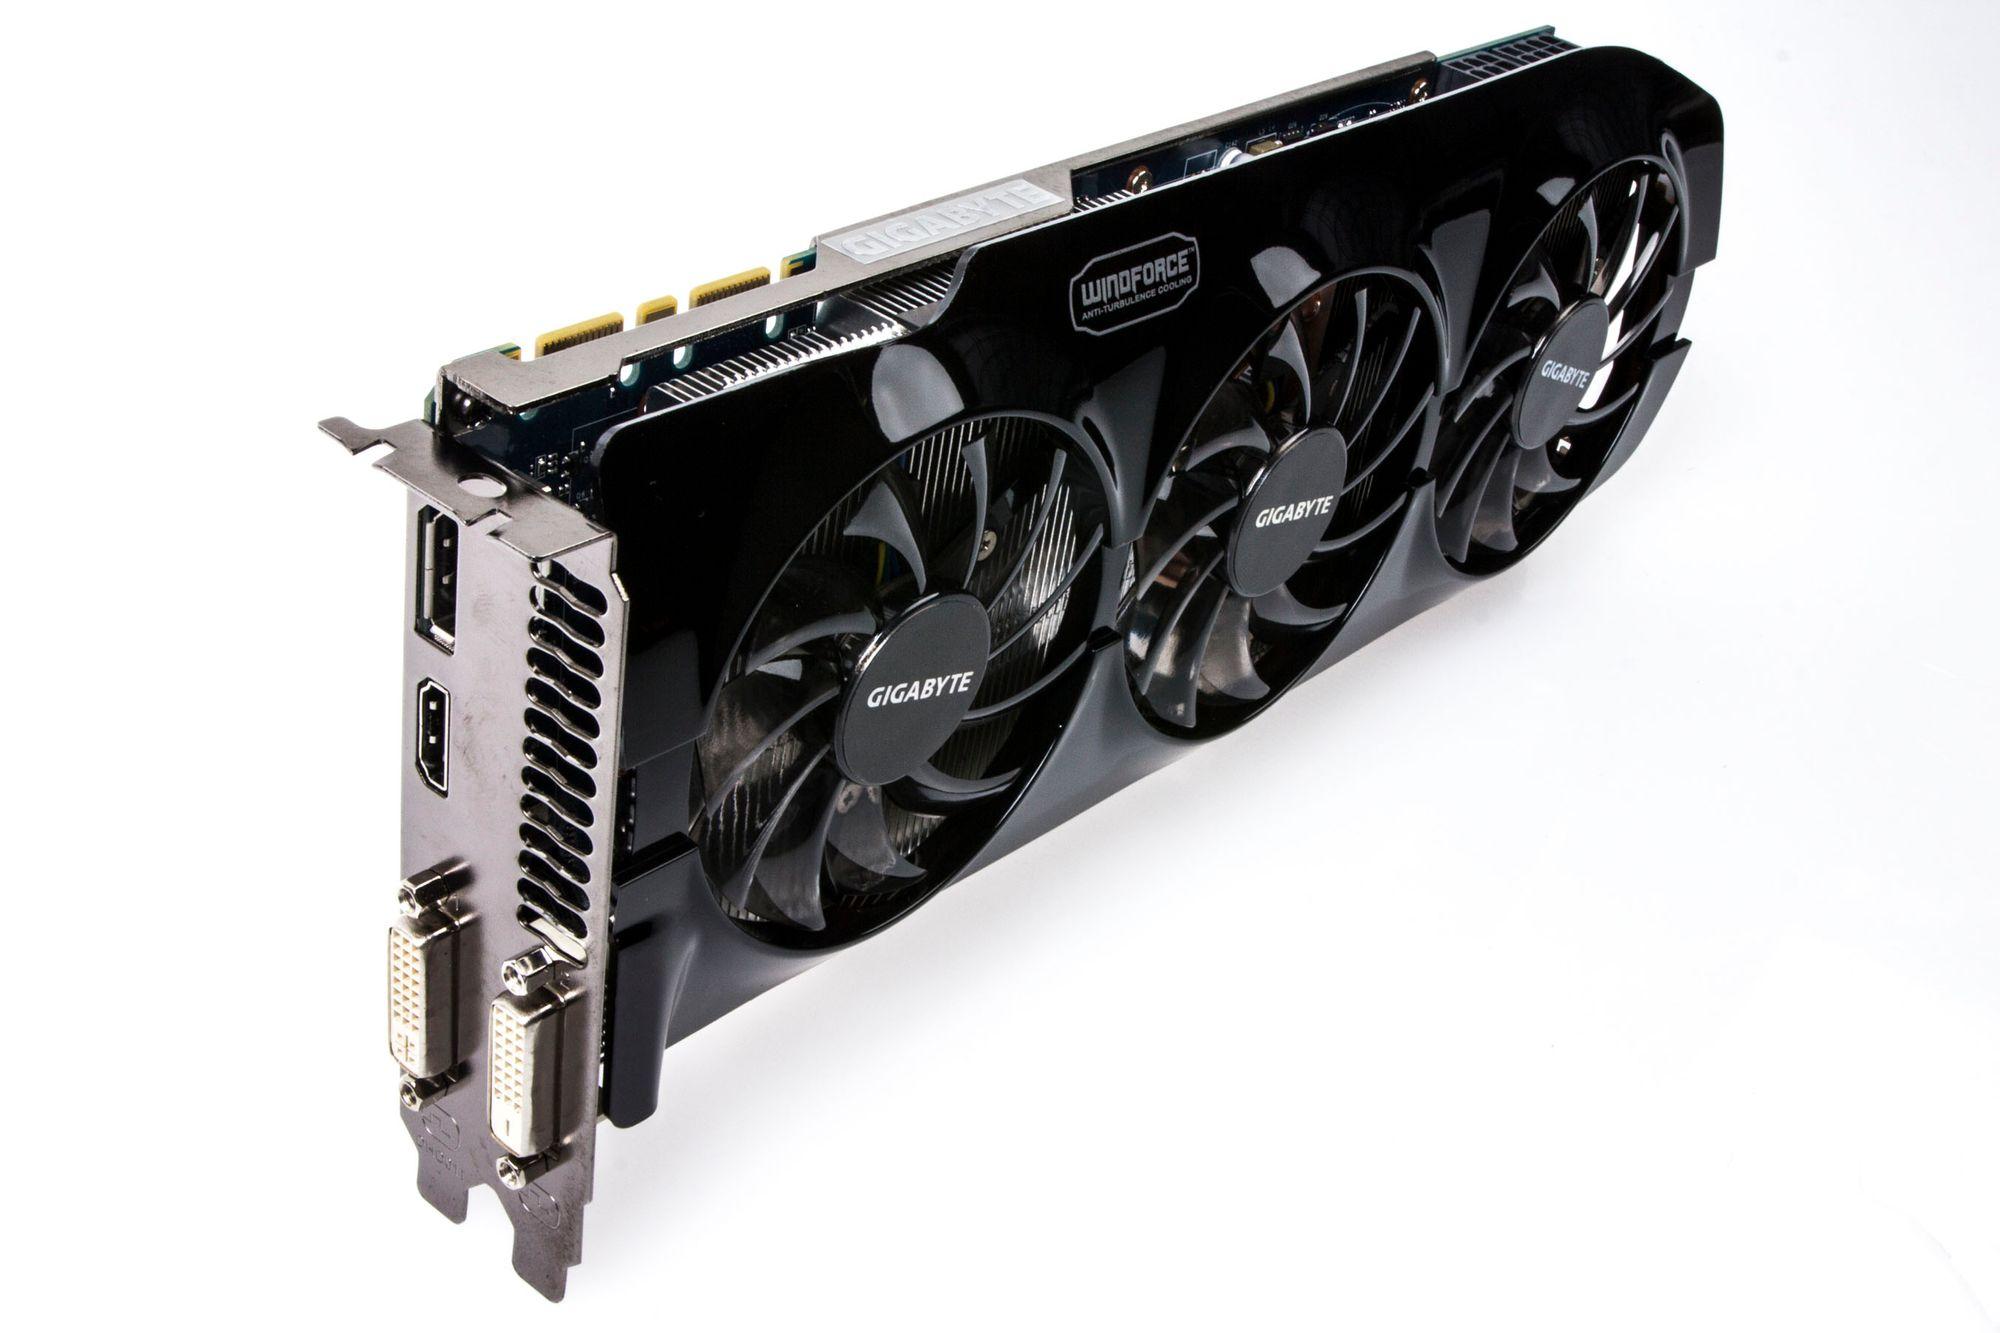 Samletest Geforce Gtx 760 Ti Gigabyte Windforce